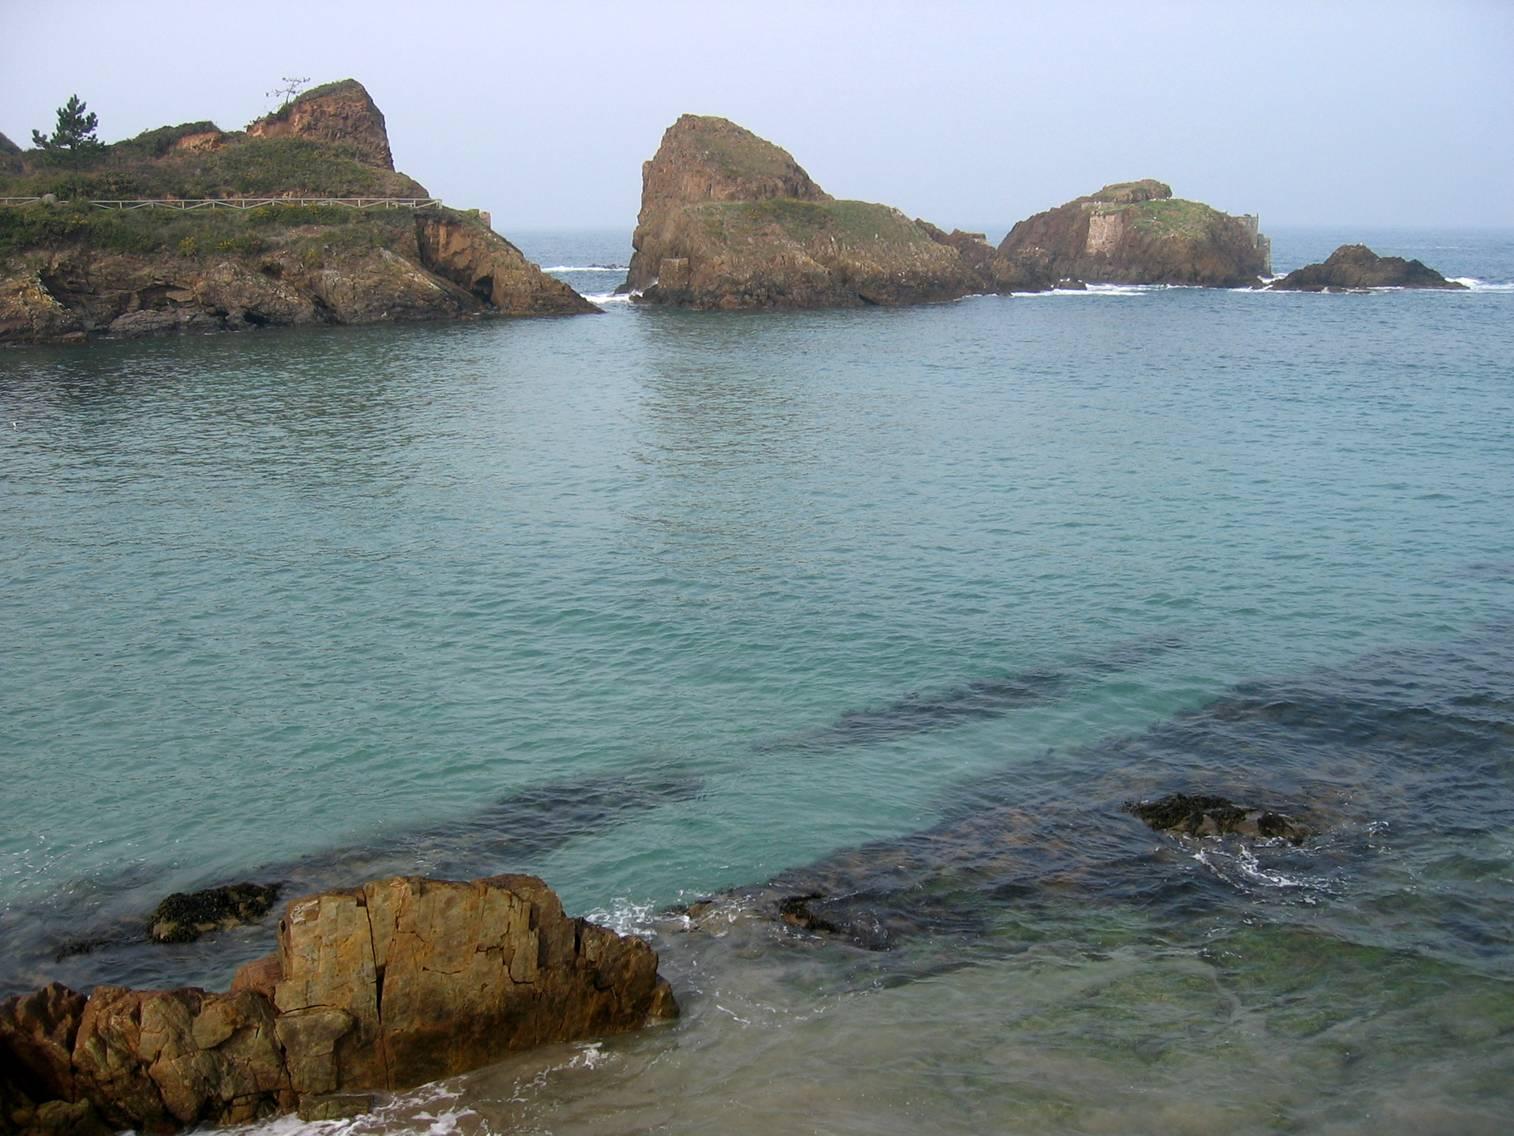 Playa Castelo / Castello